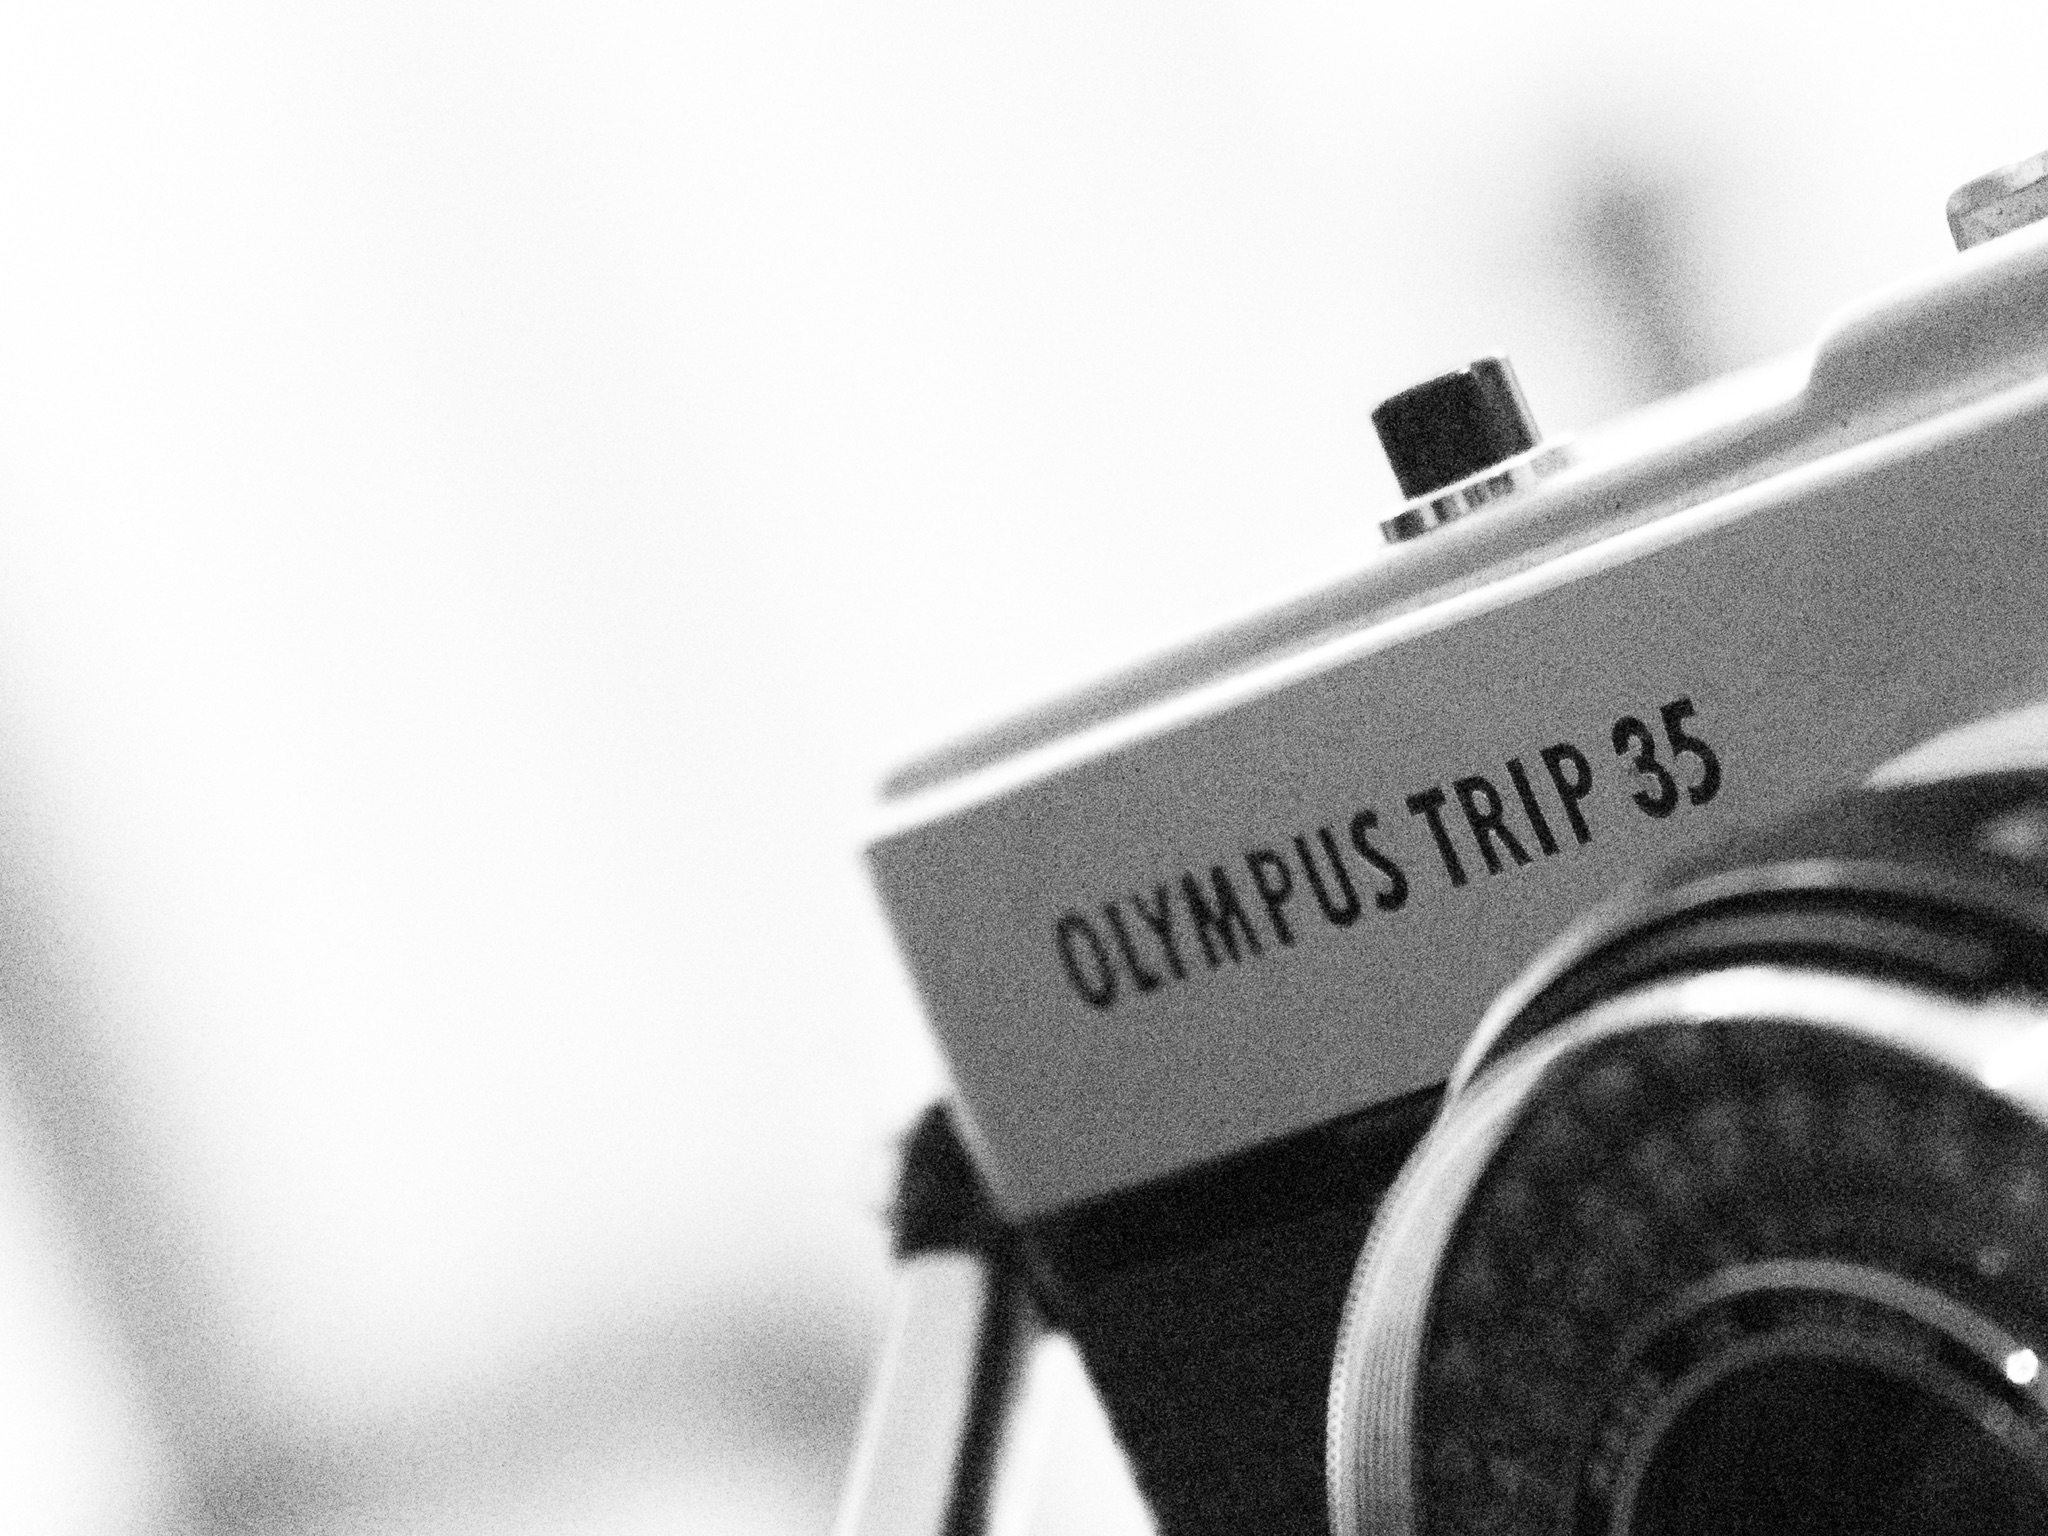 Olympus Jay McLaughlin Trip 35